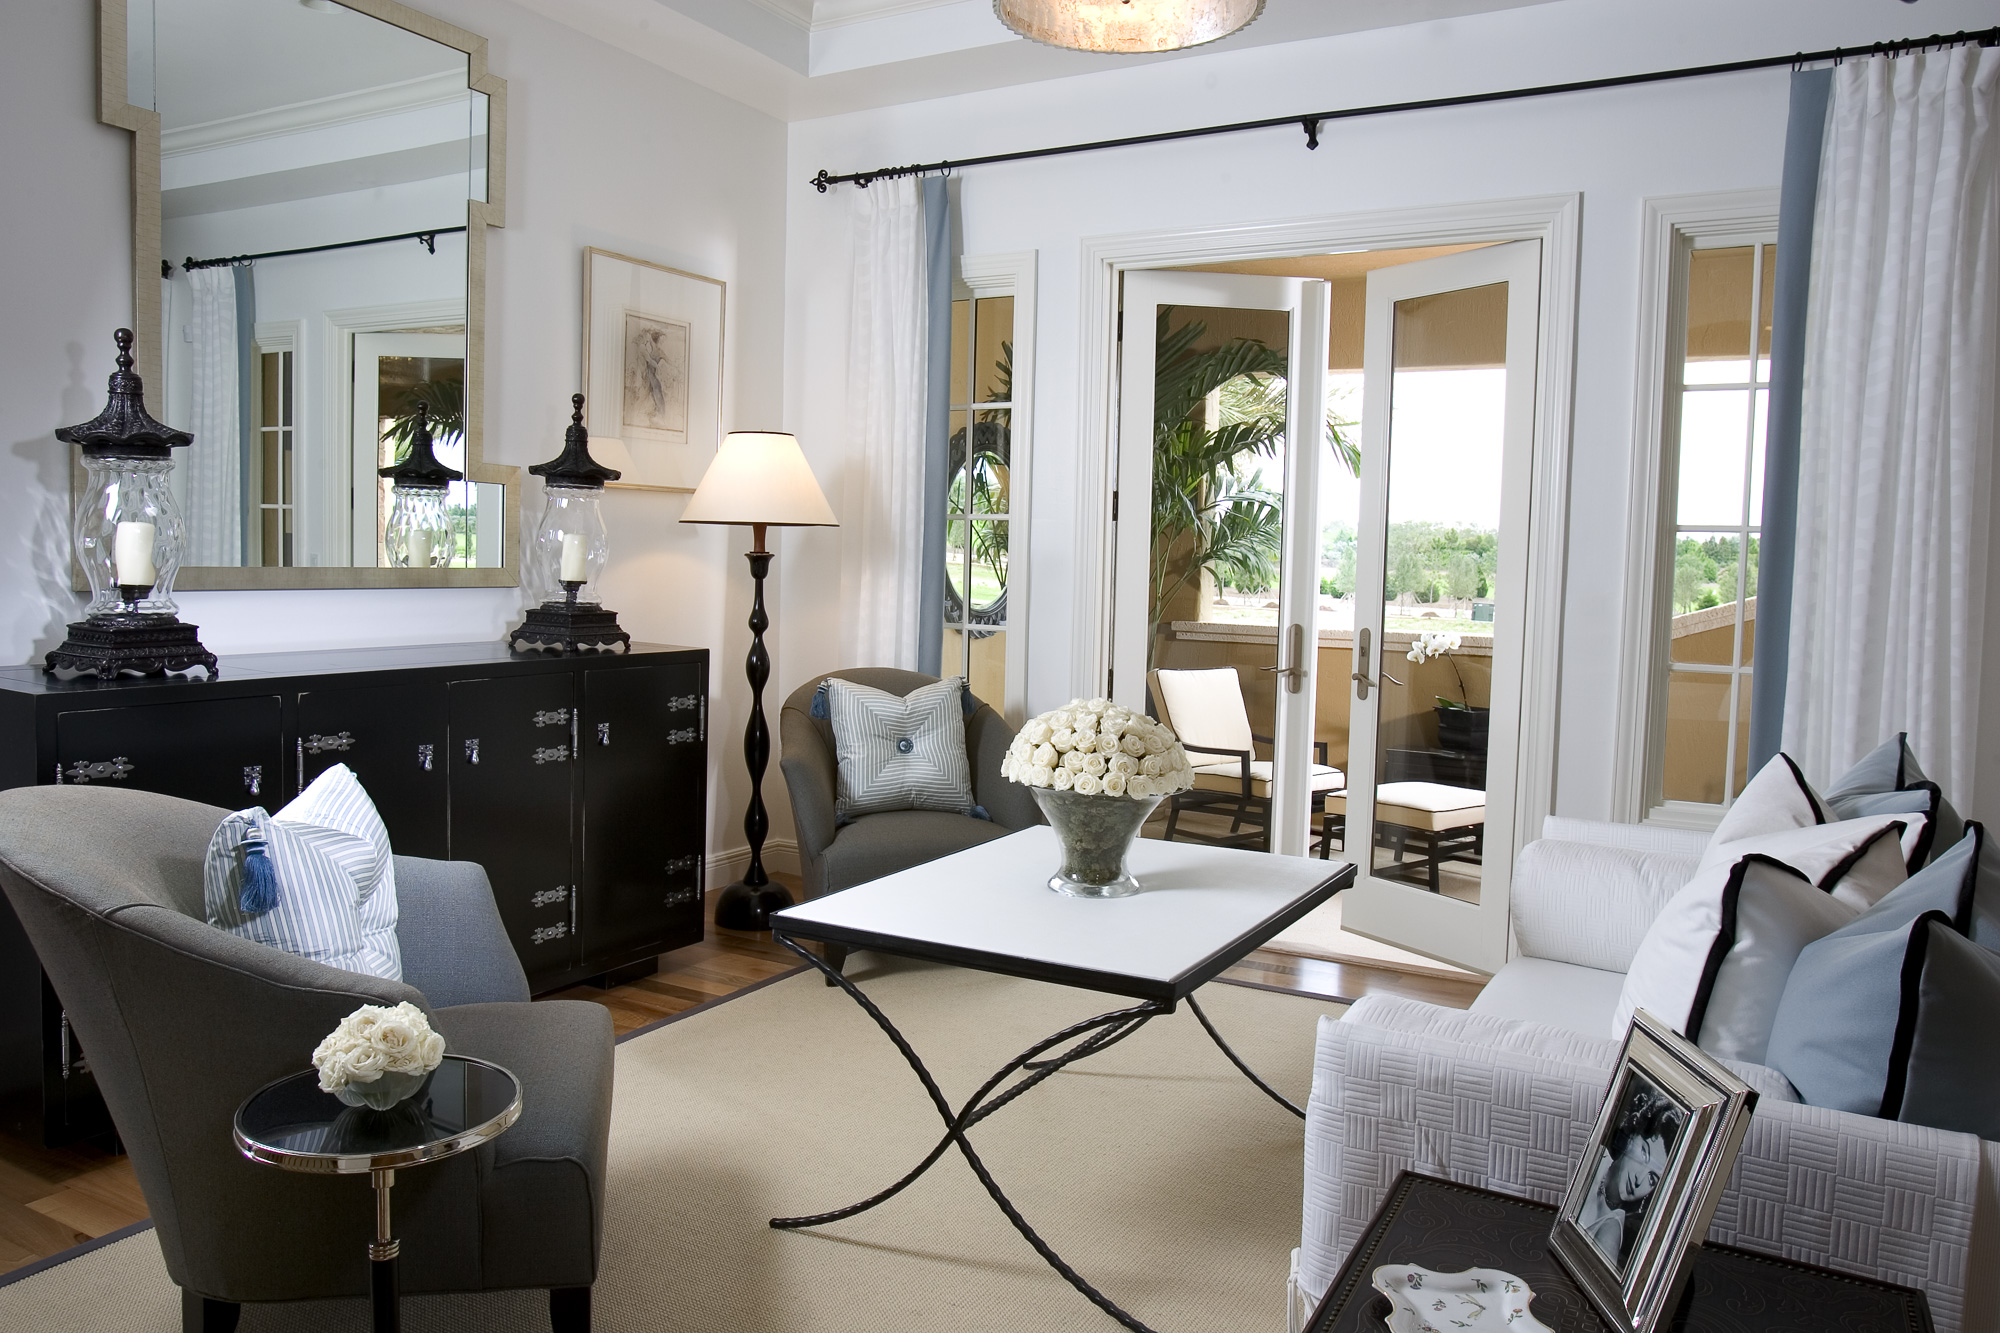 transitional interior design gallery | malibu west interiors